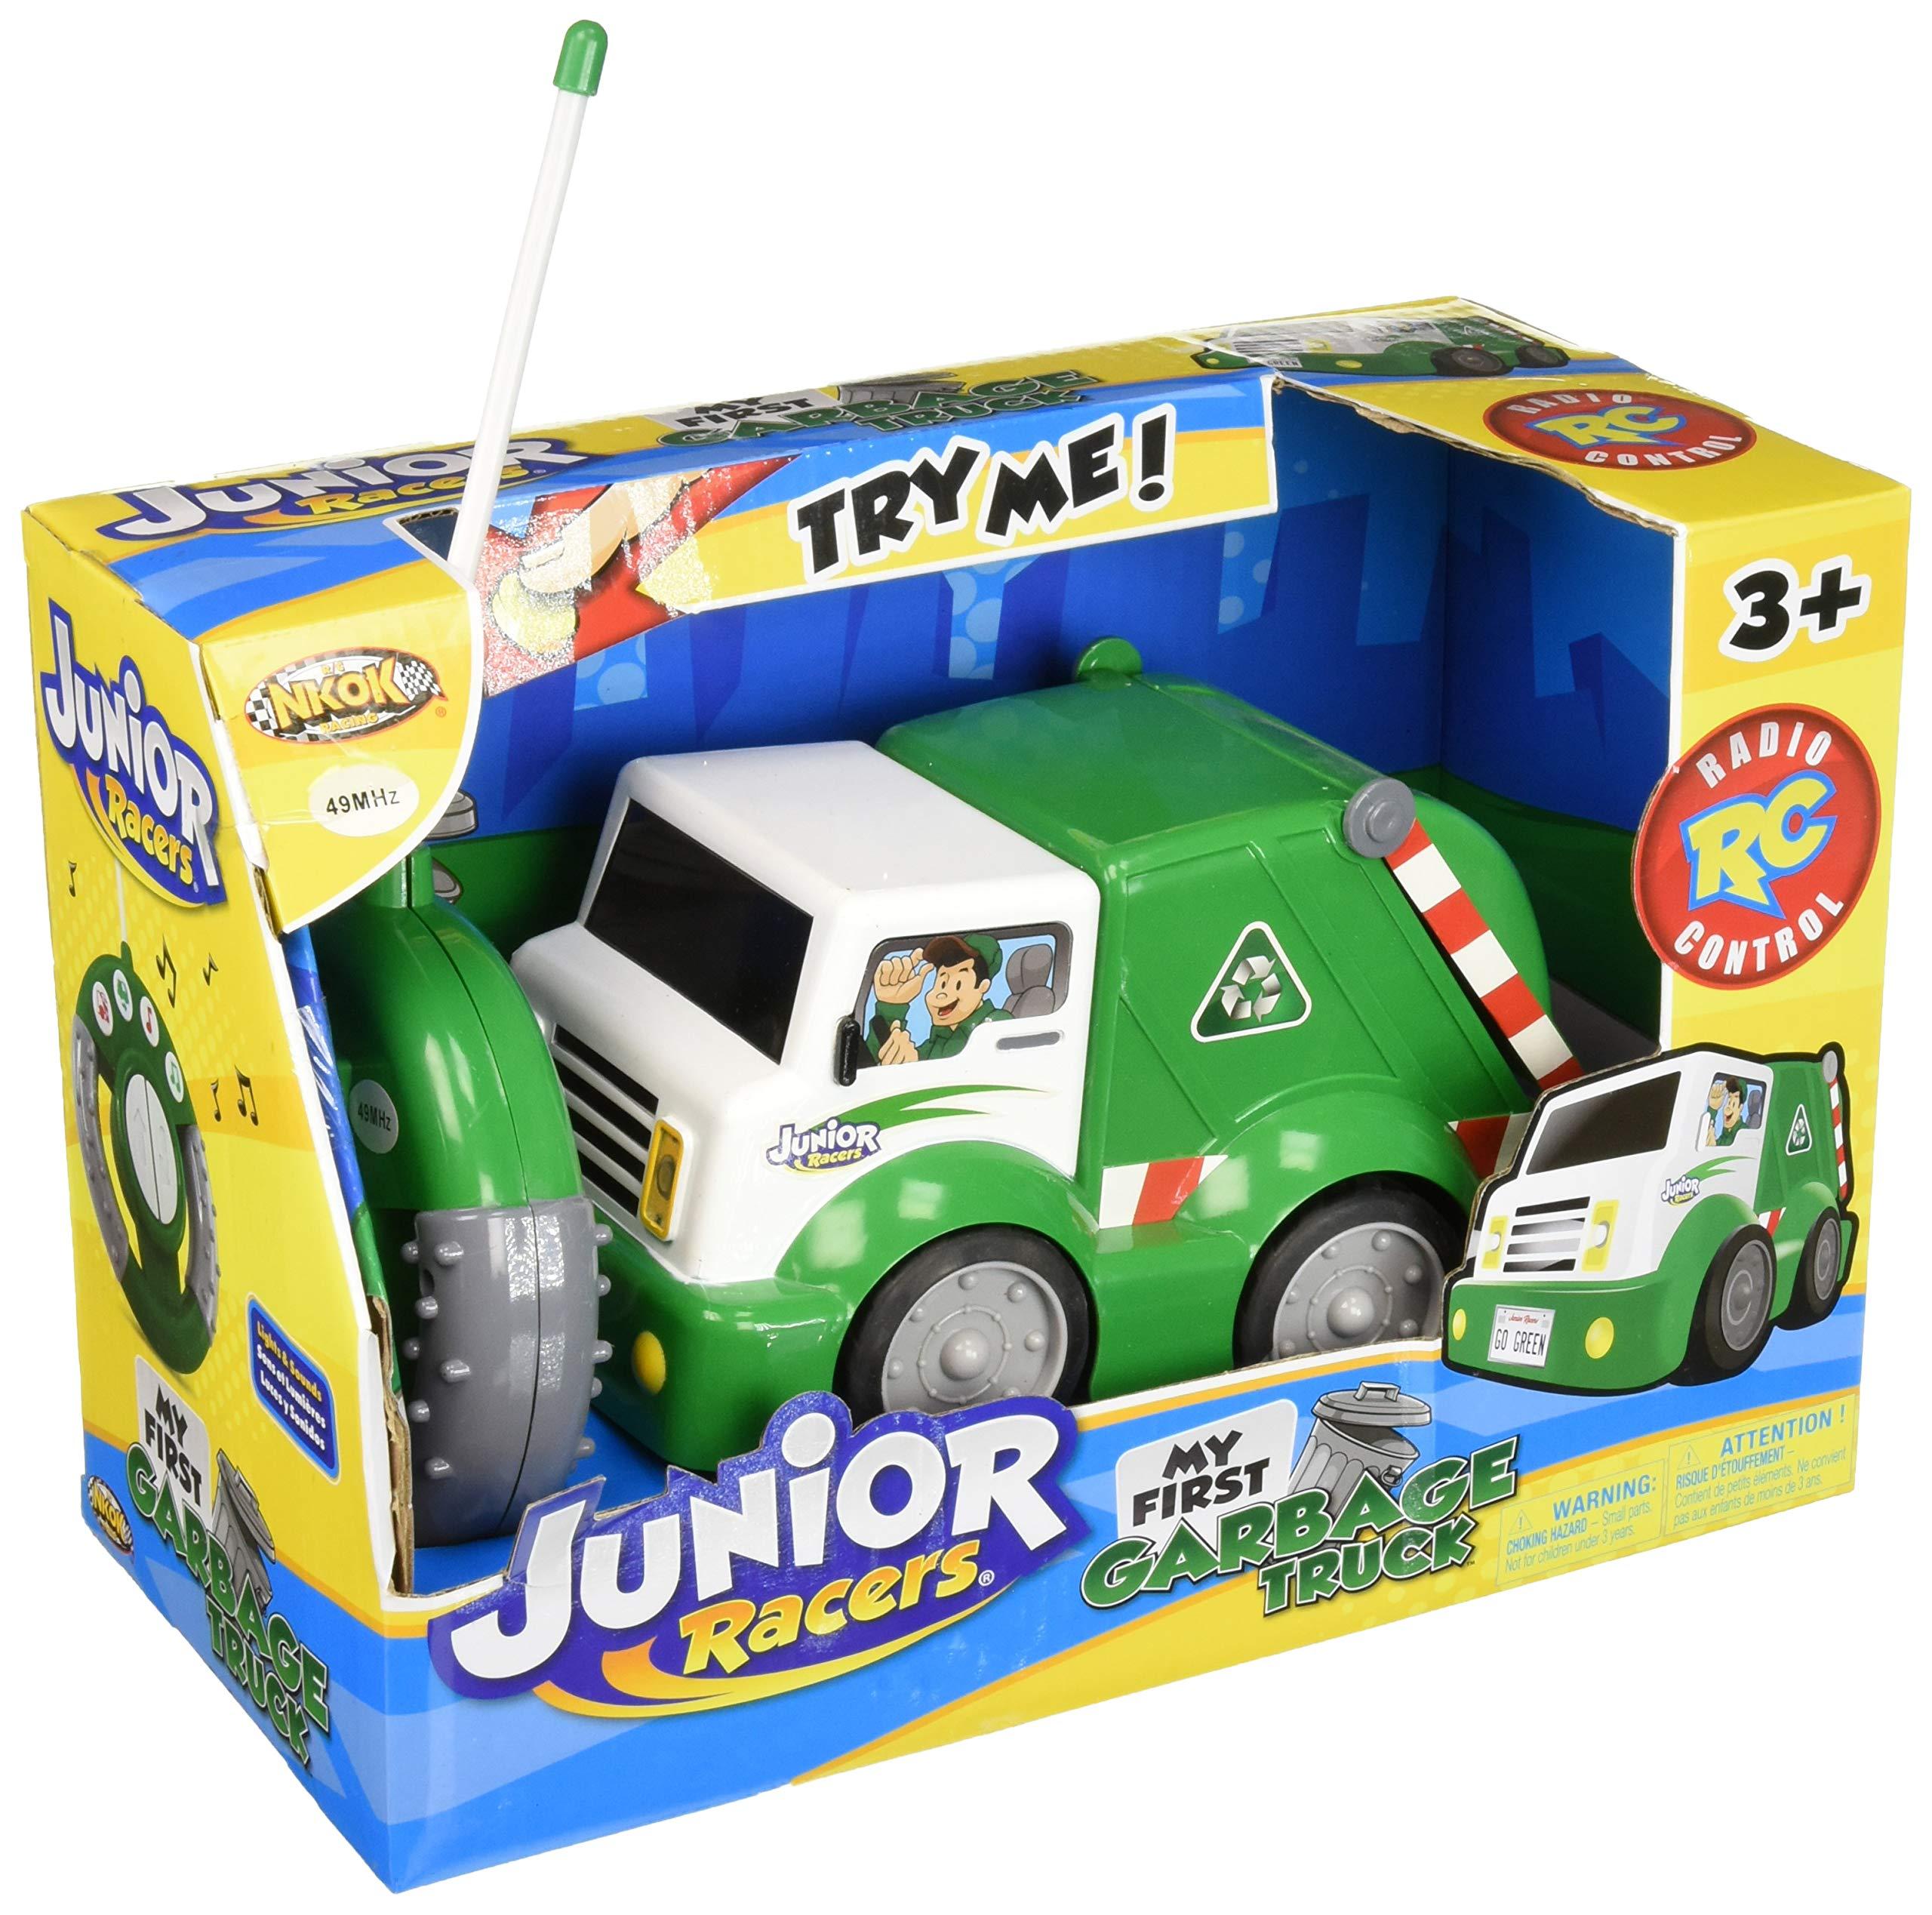 NKOK Junior Racers RC My First Garbage Truck